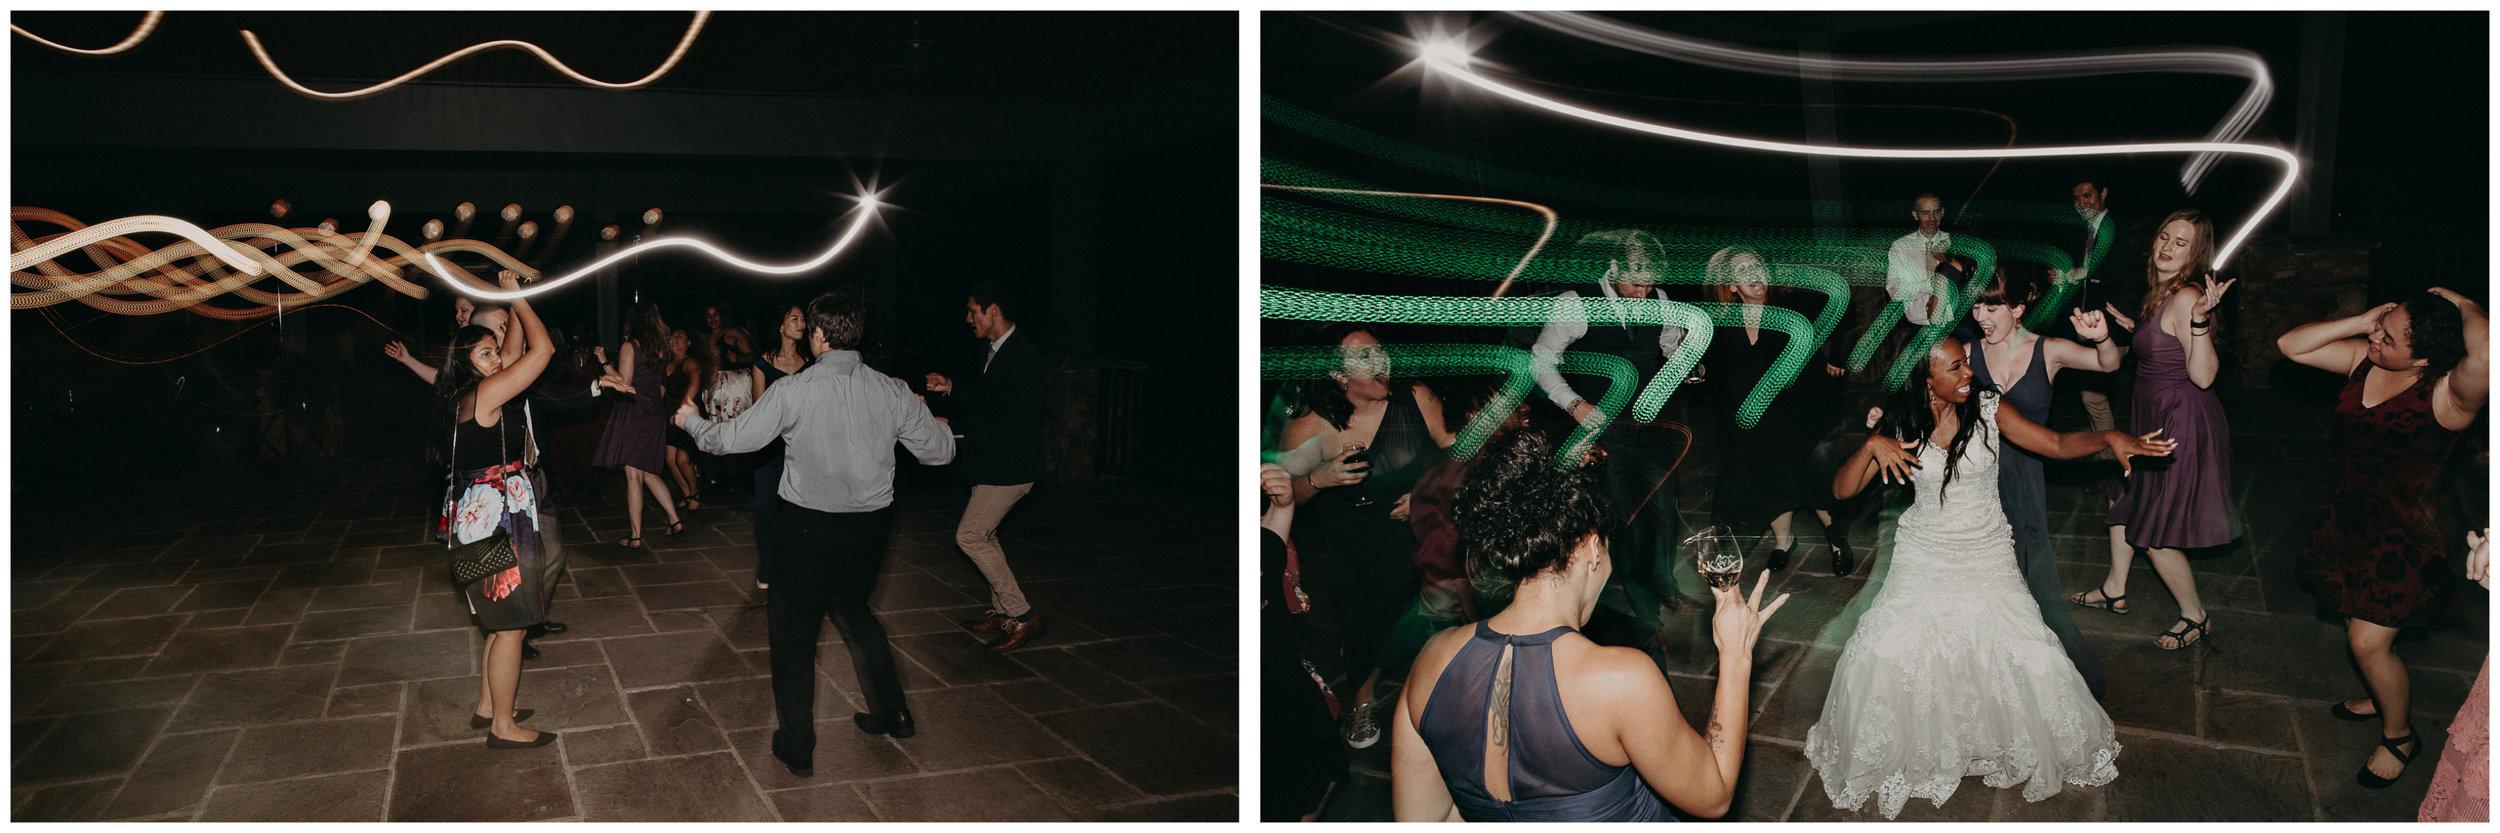 95- Kaya_vineyard_dahlonega_wedding_venue_detais_reception_aline_marin_photography.jpg